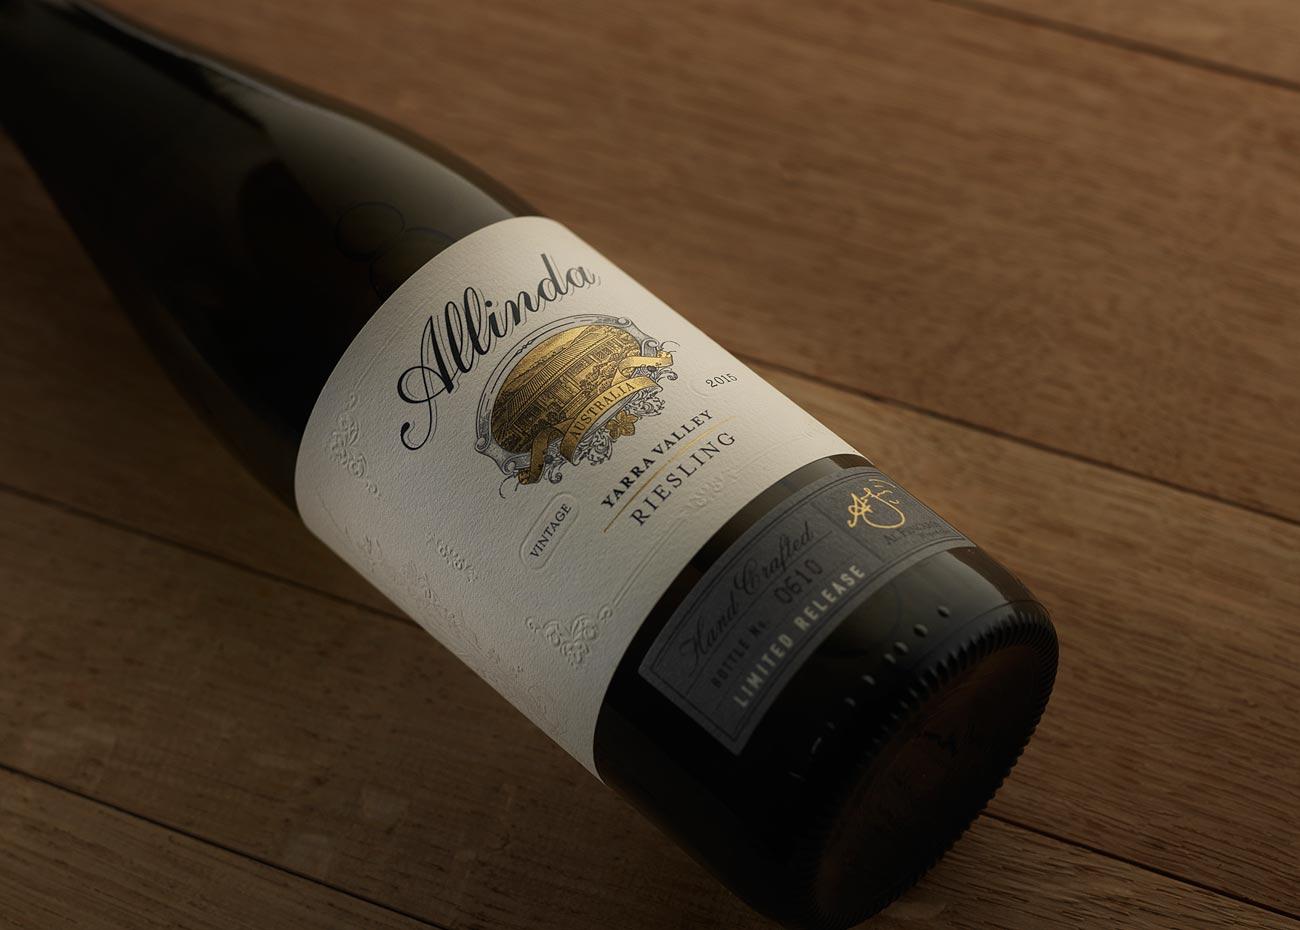 product-wine-bottle-photography-3.jpg